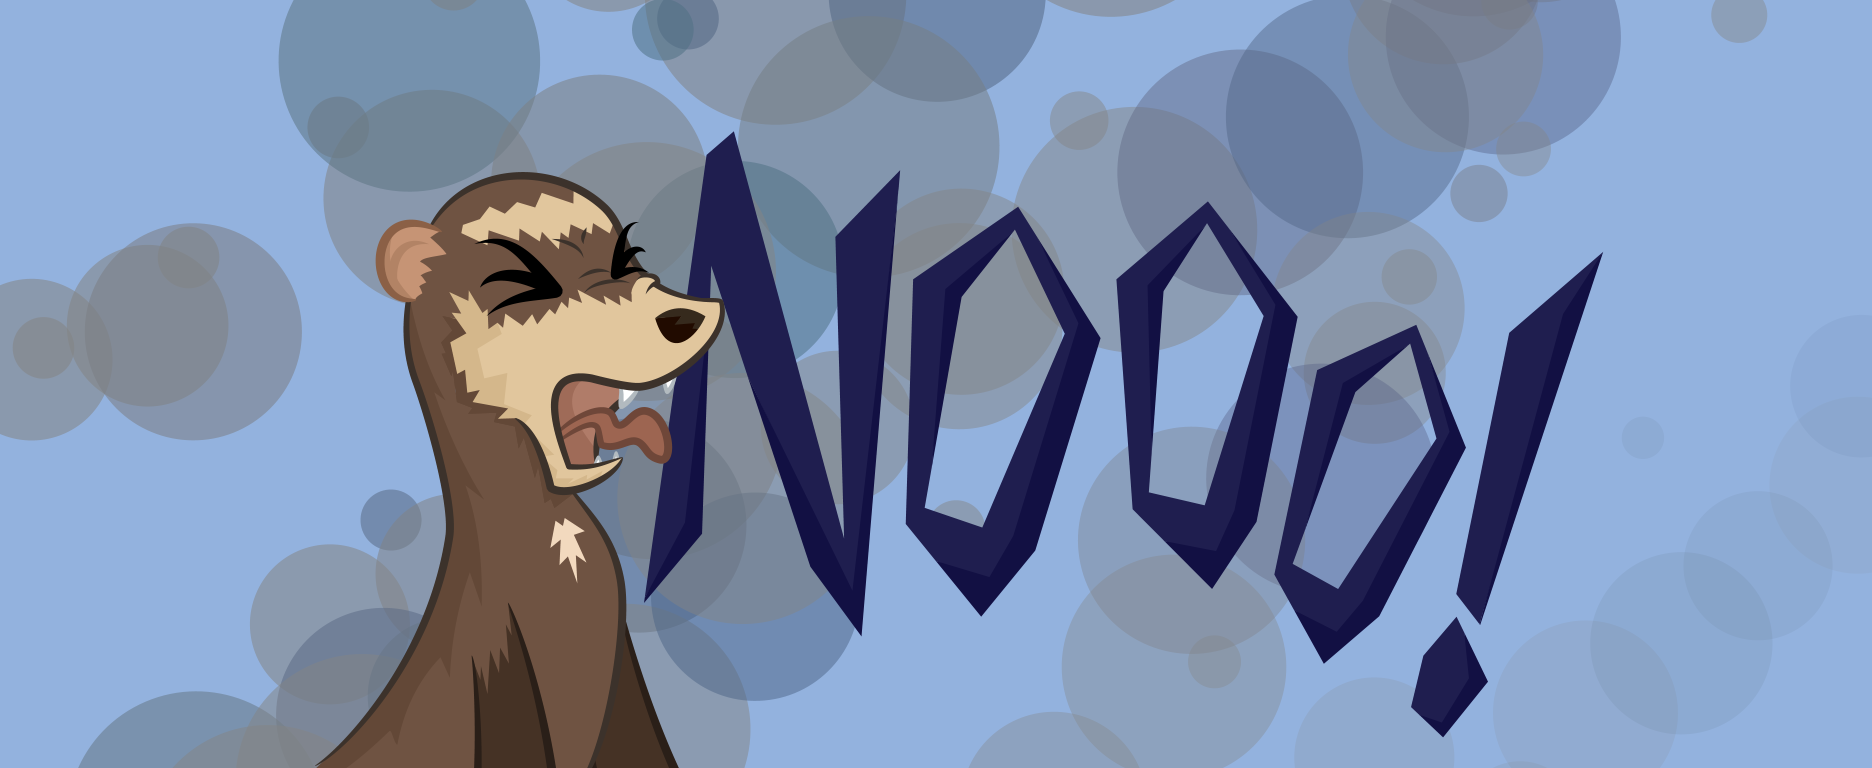 Ferret - Nooo! by Java--Jive